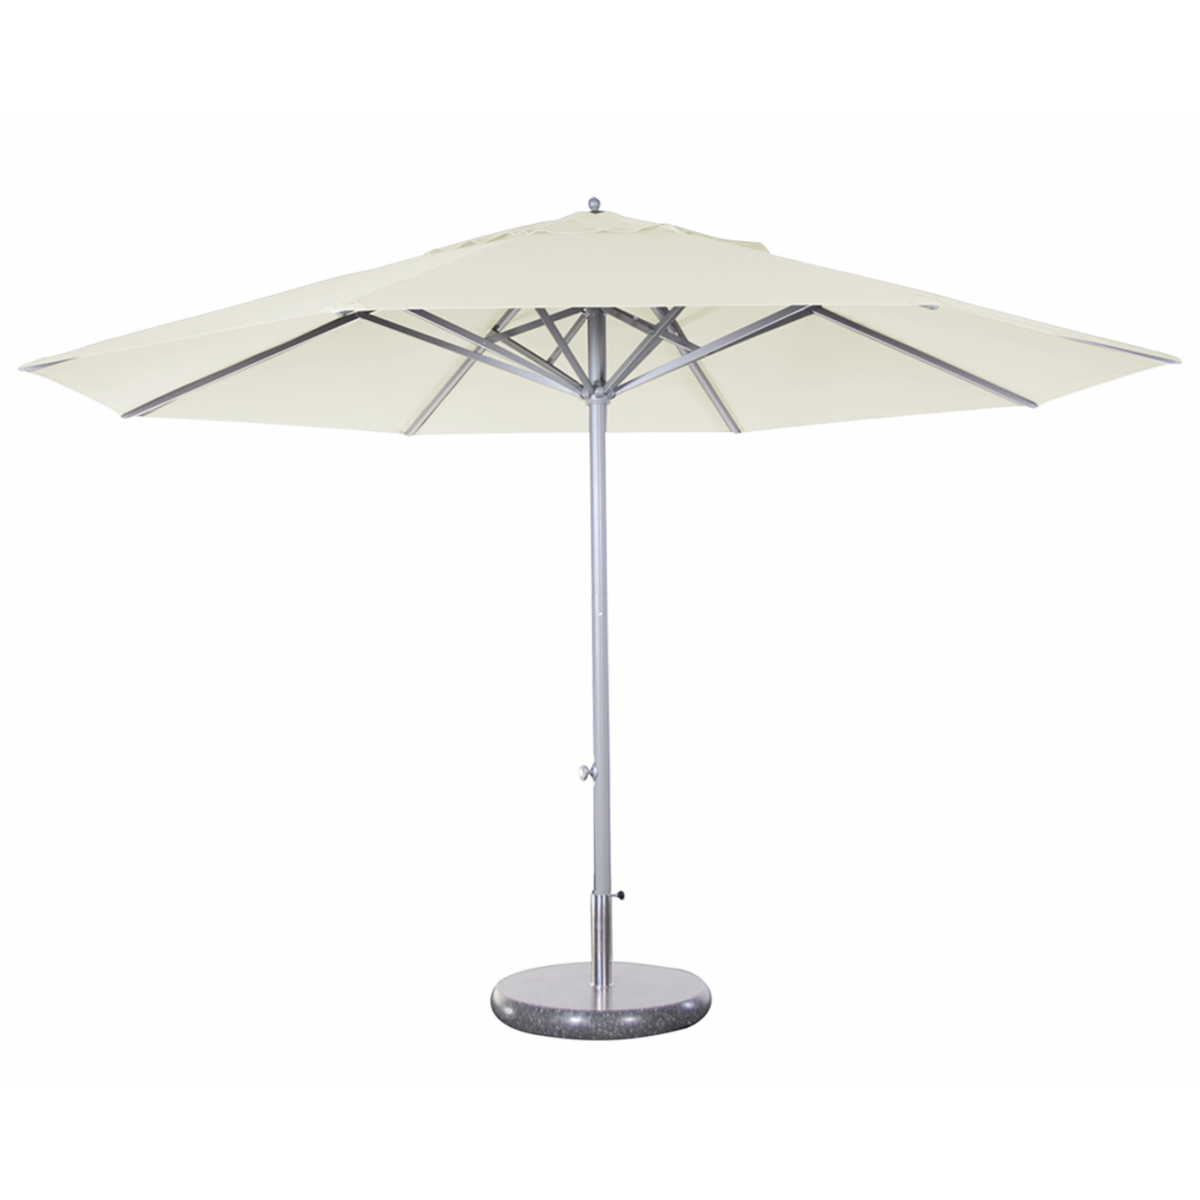 Parasol presto solero m t central ouverture facile en for Grand parasol de terrasse